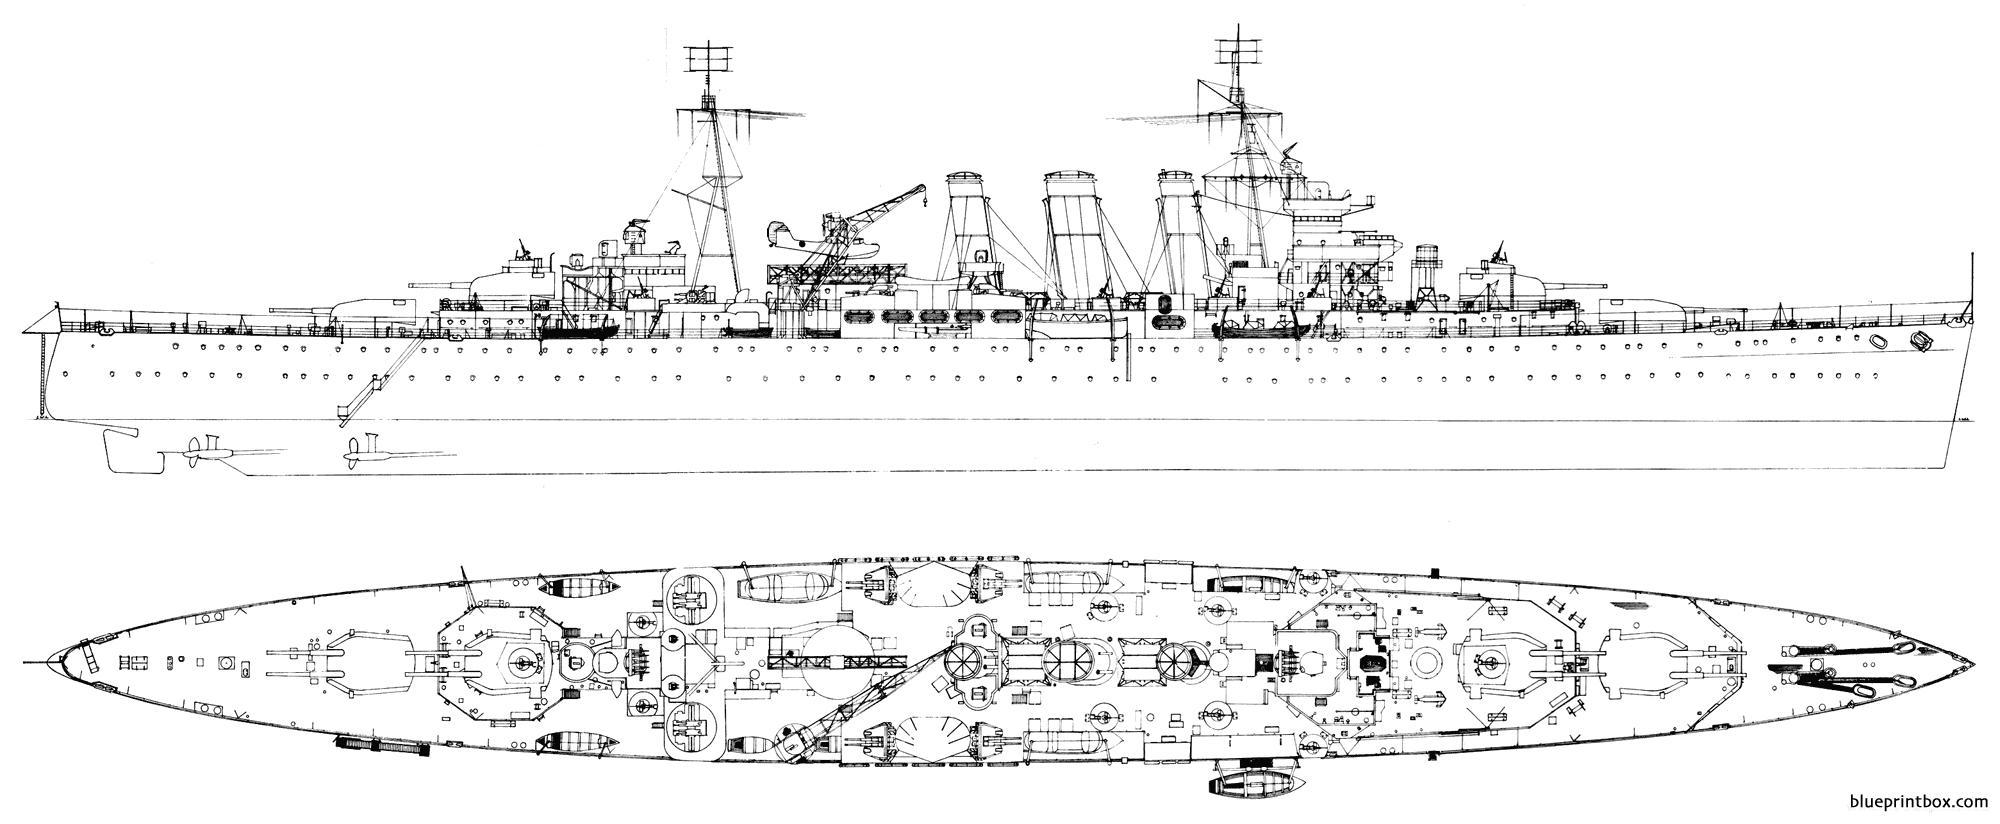 Hms Sussex 1943 Heavy Cruiser - Blueprintbox Com